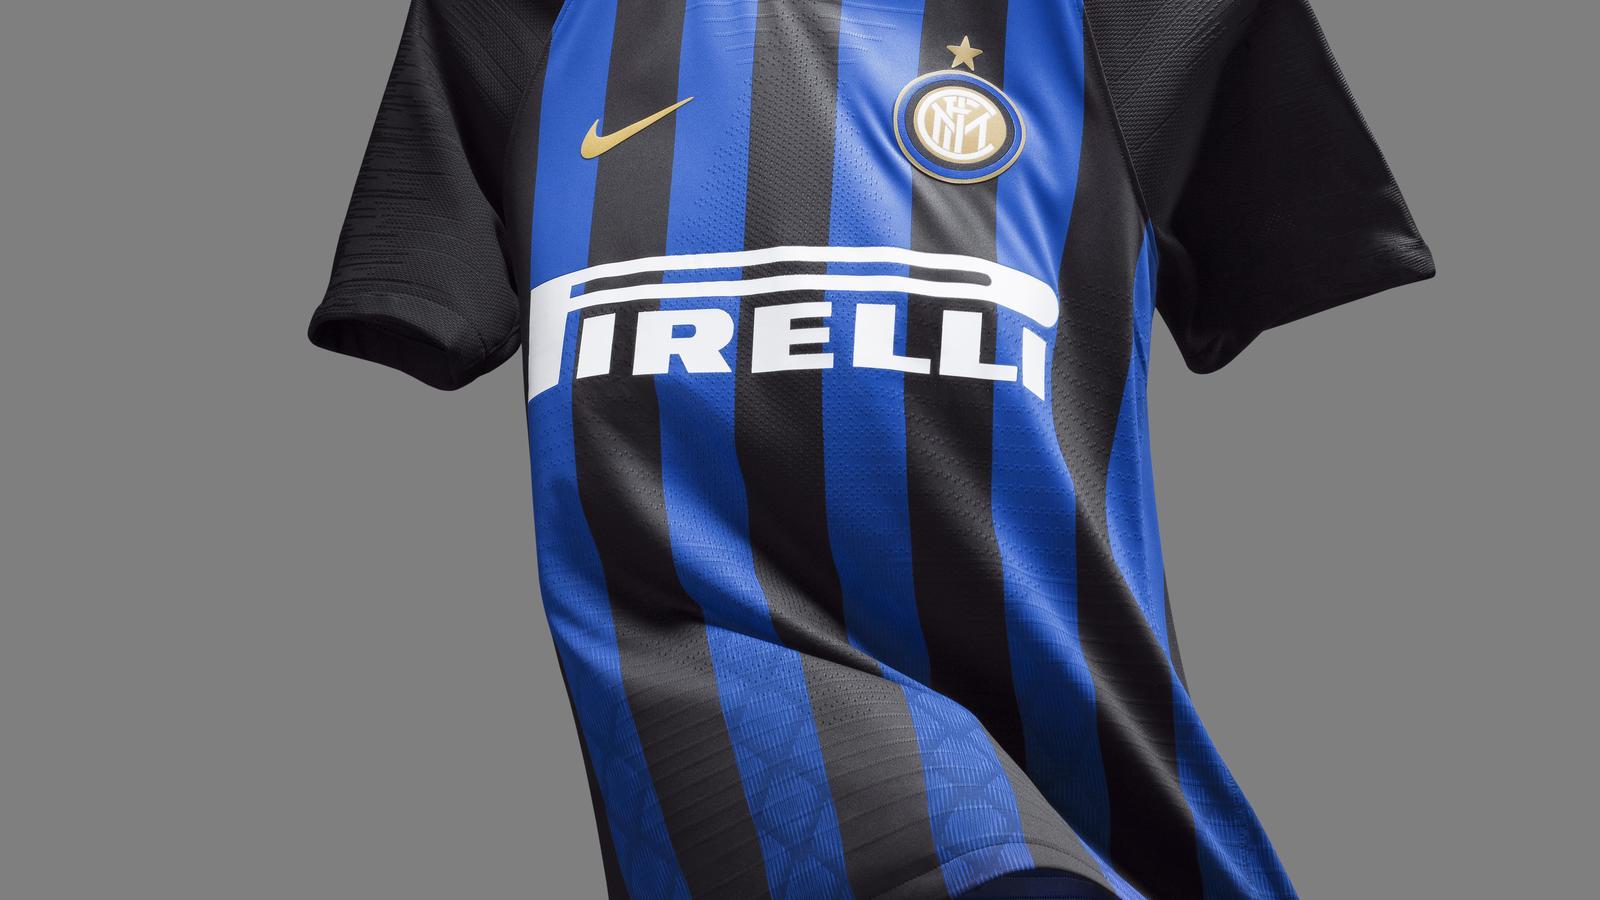 Inter 01 hd 1600